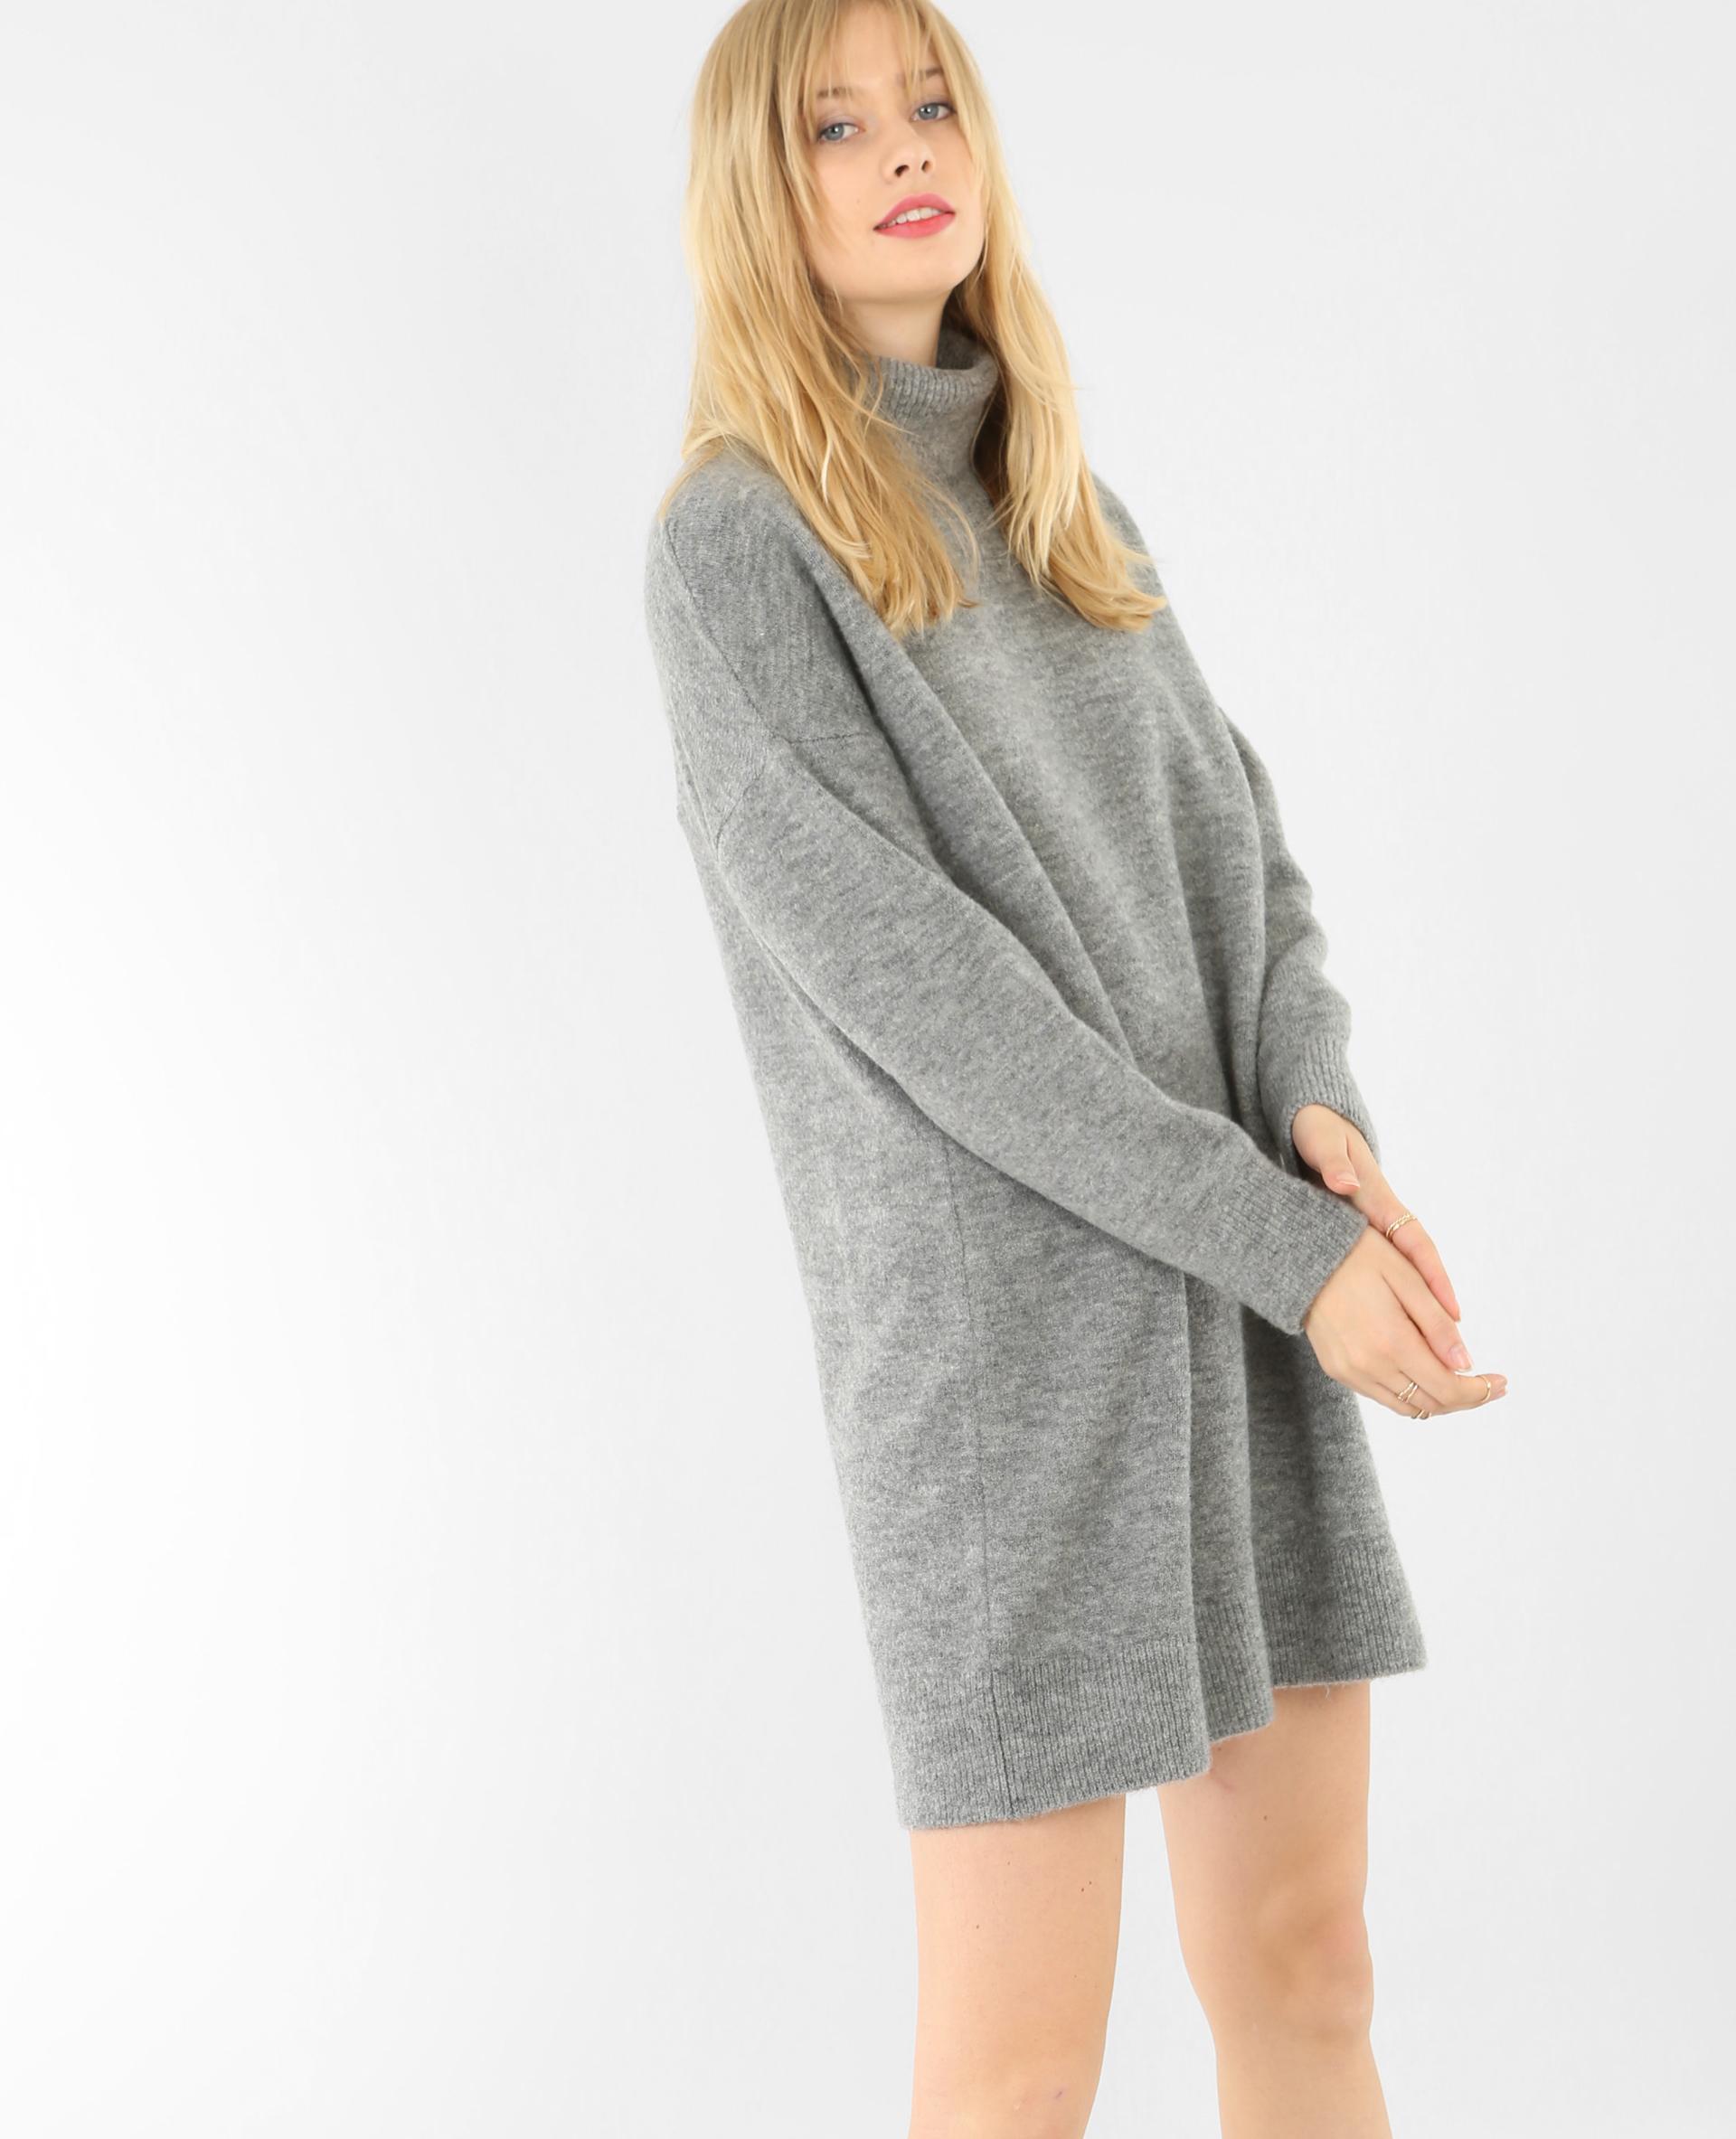 robe d hiver pimkie robe classique site blog photo. Black Bedroom Furniture Sets. Home Design Ideas